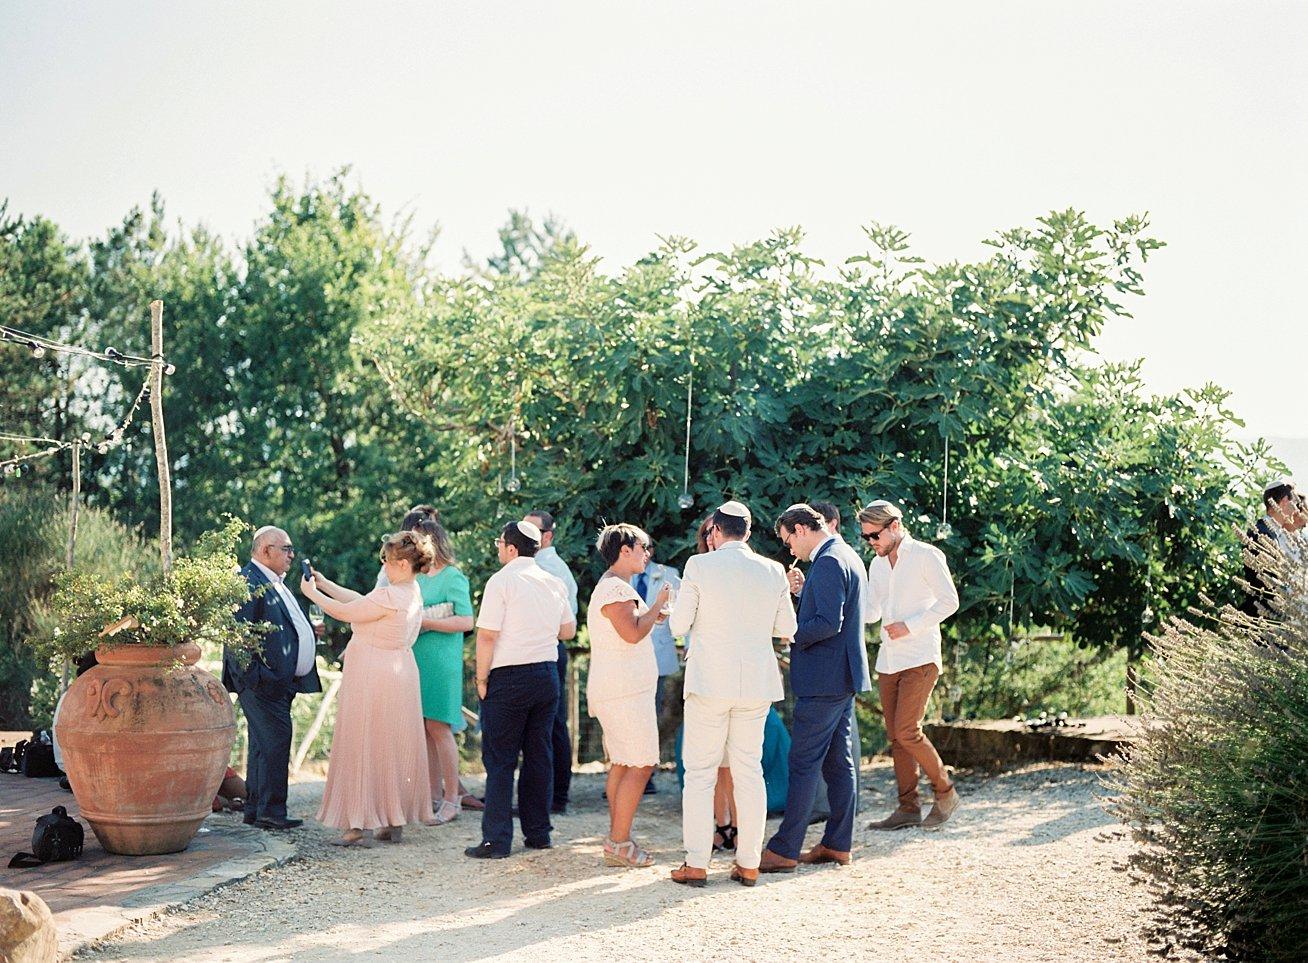 Amanda-Drost-Fotografie-Bruioft-Italie-Trouwen-buitenland-destination-wedding-italy_0052.jpg